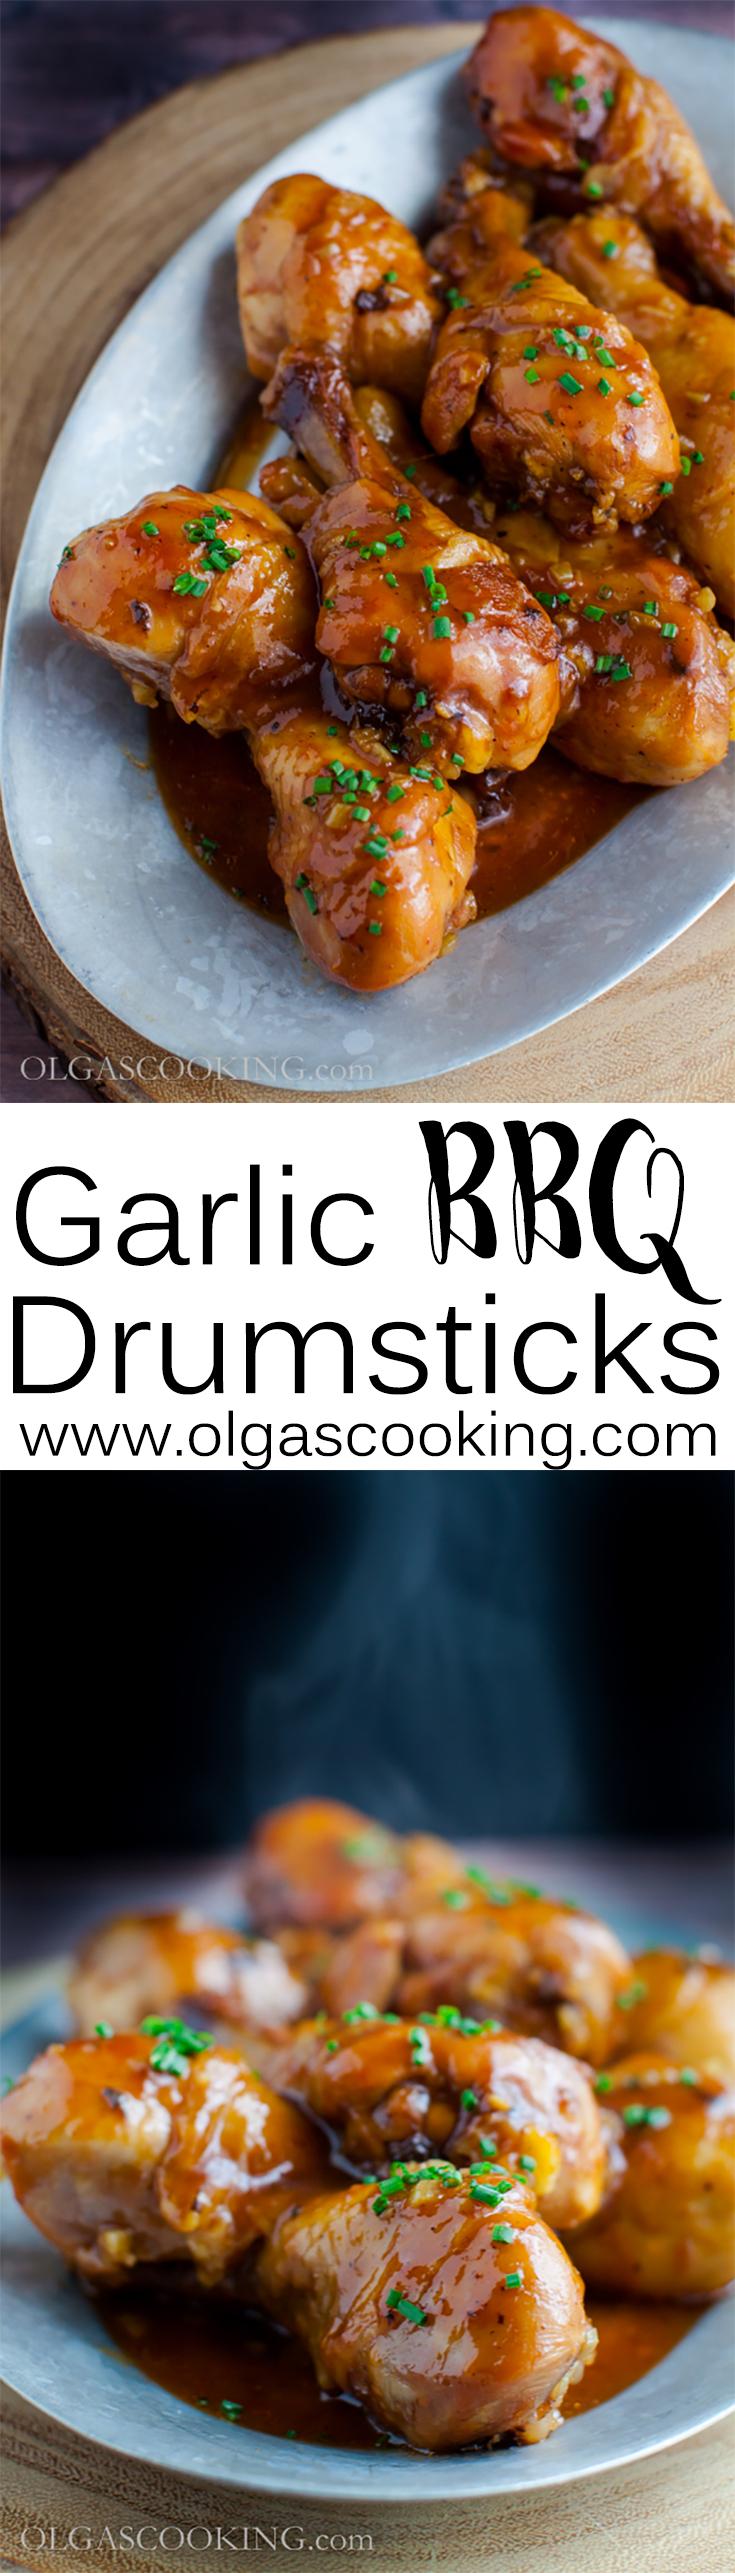 Garlic BBQ Drumsticks Recipe